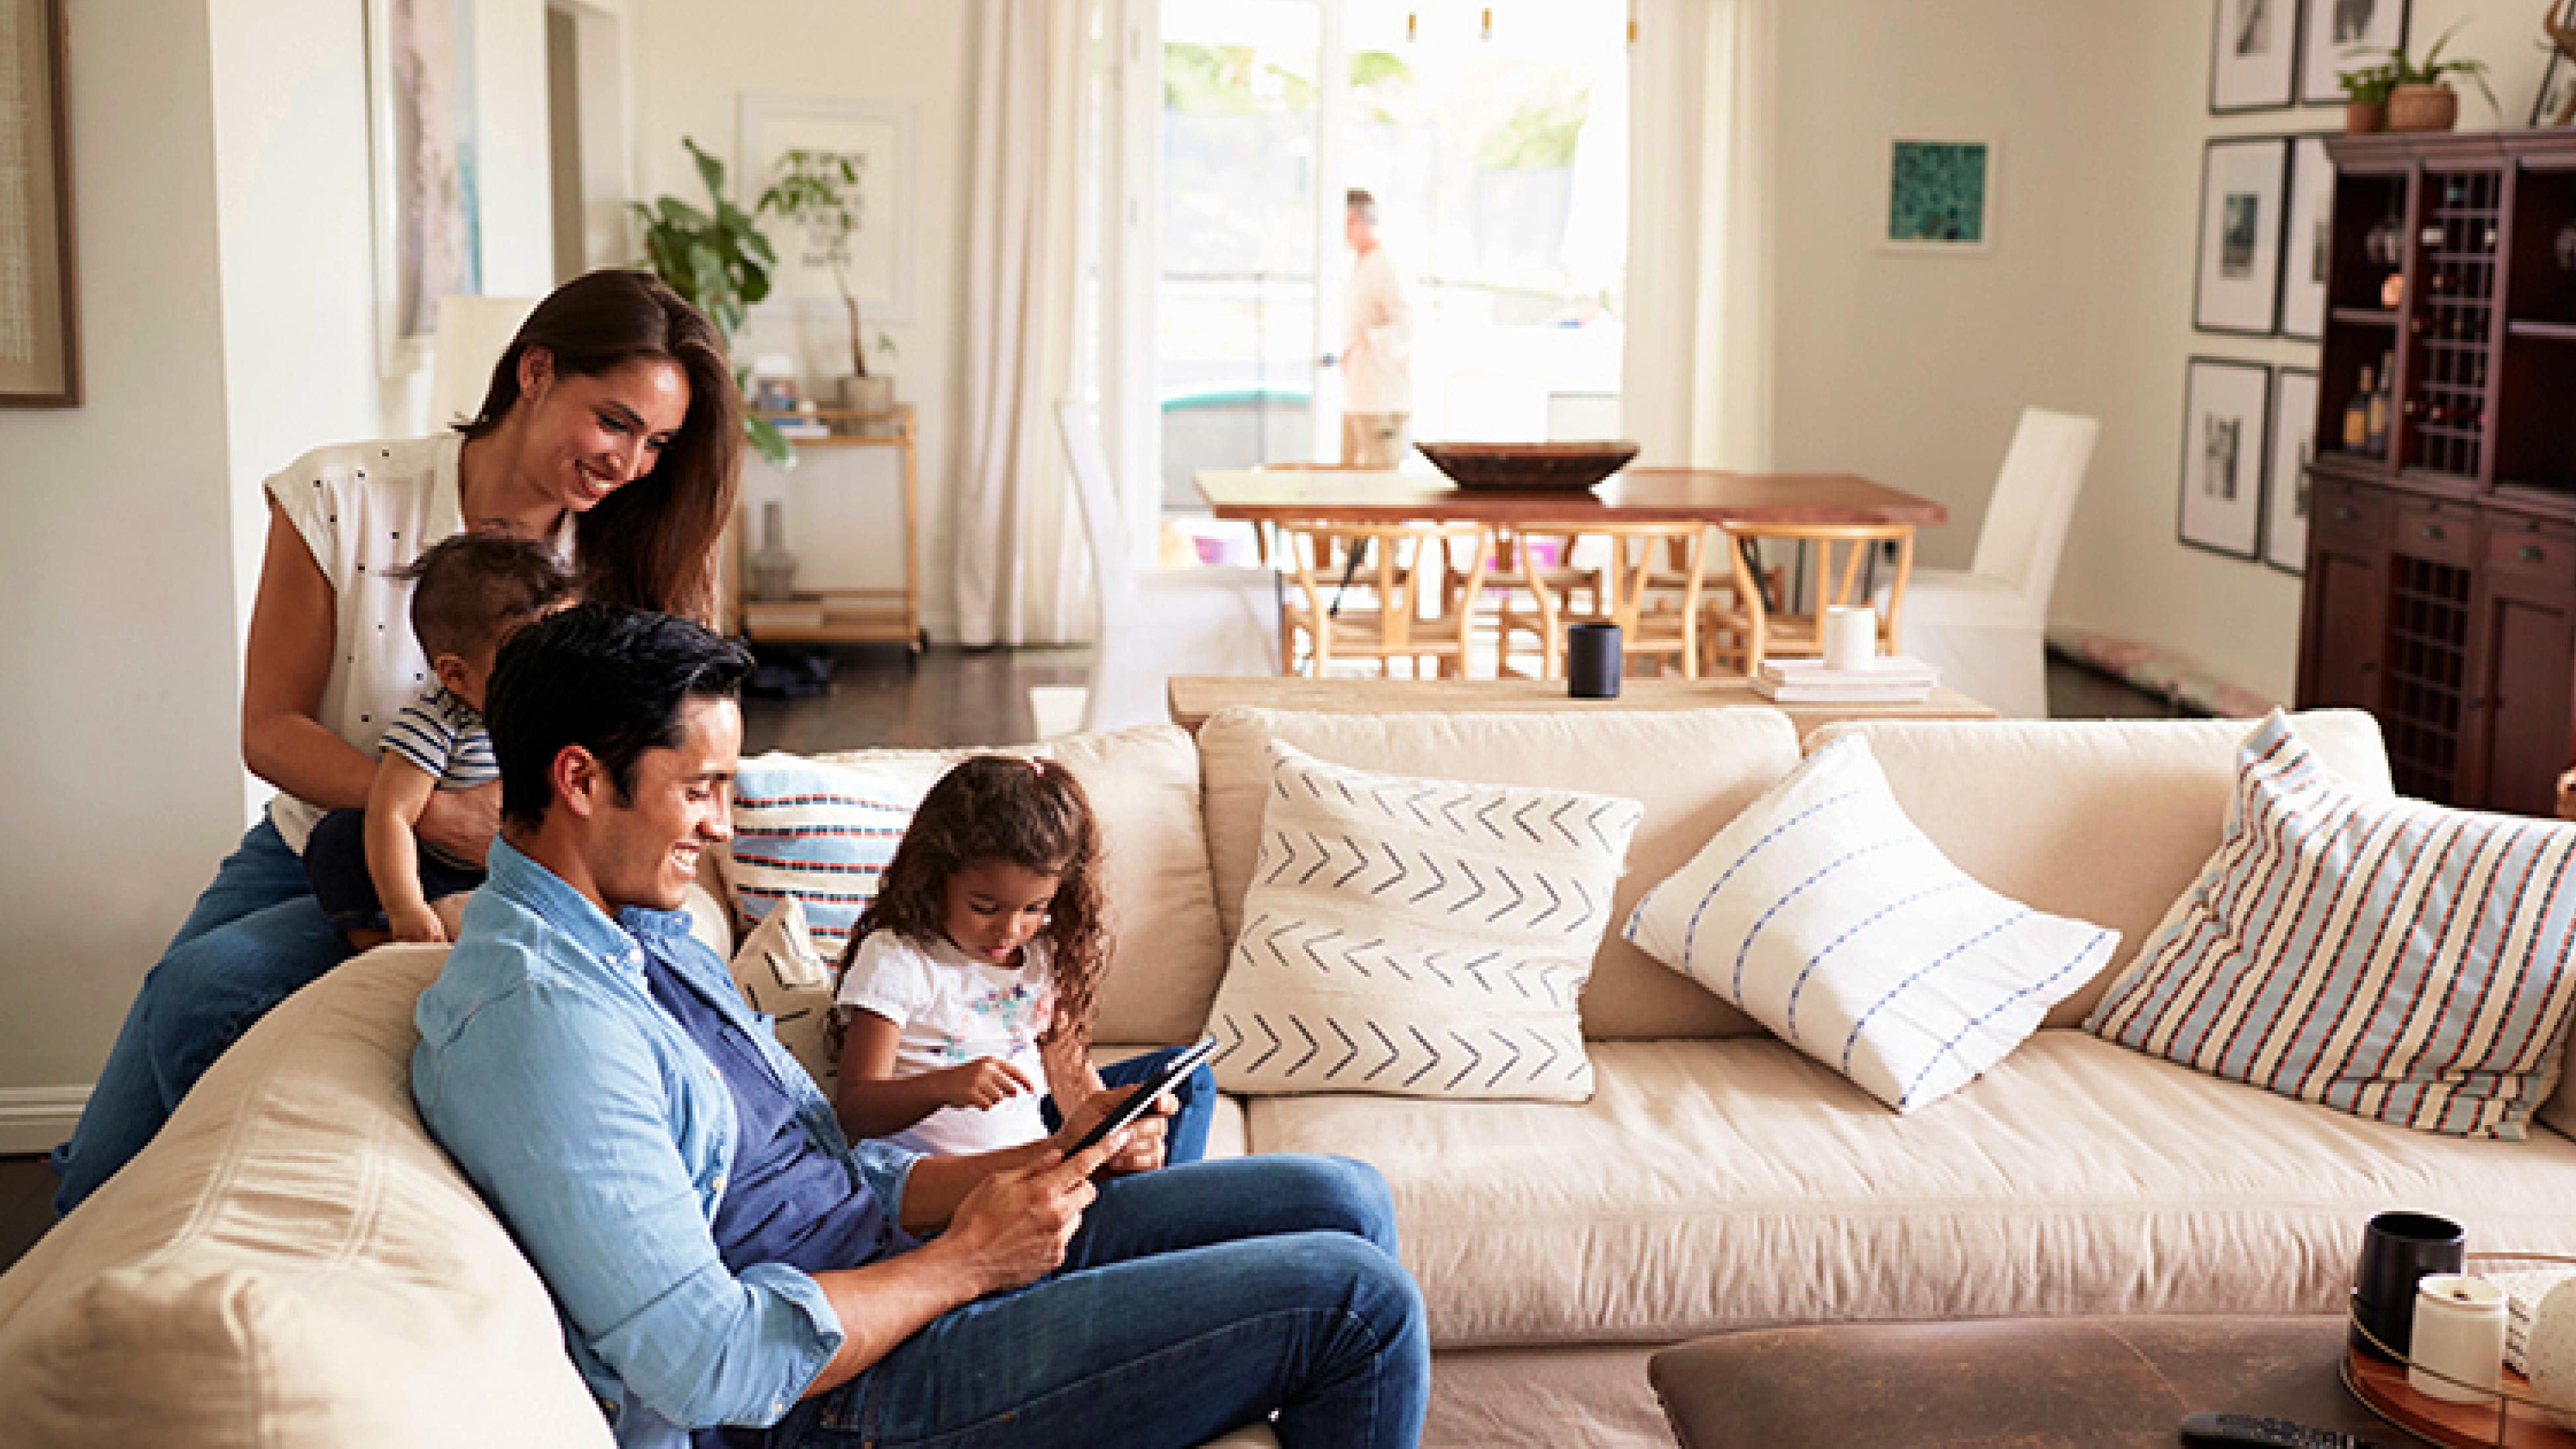 Clipsal Virtual Smart Home case study hero image